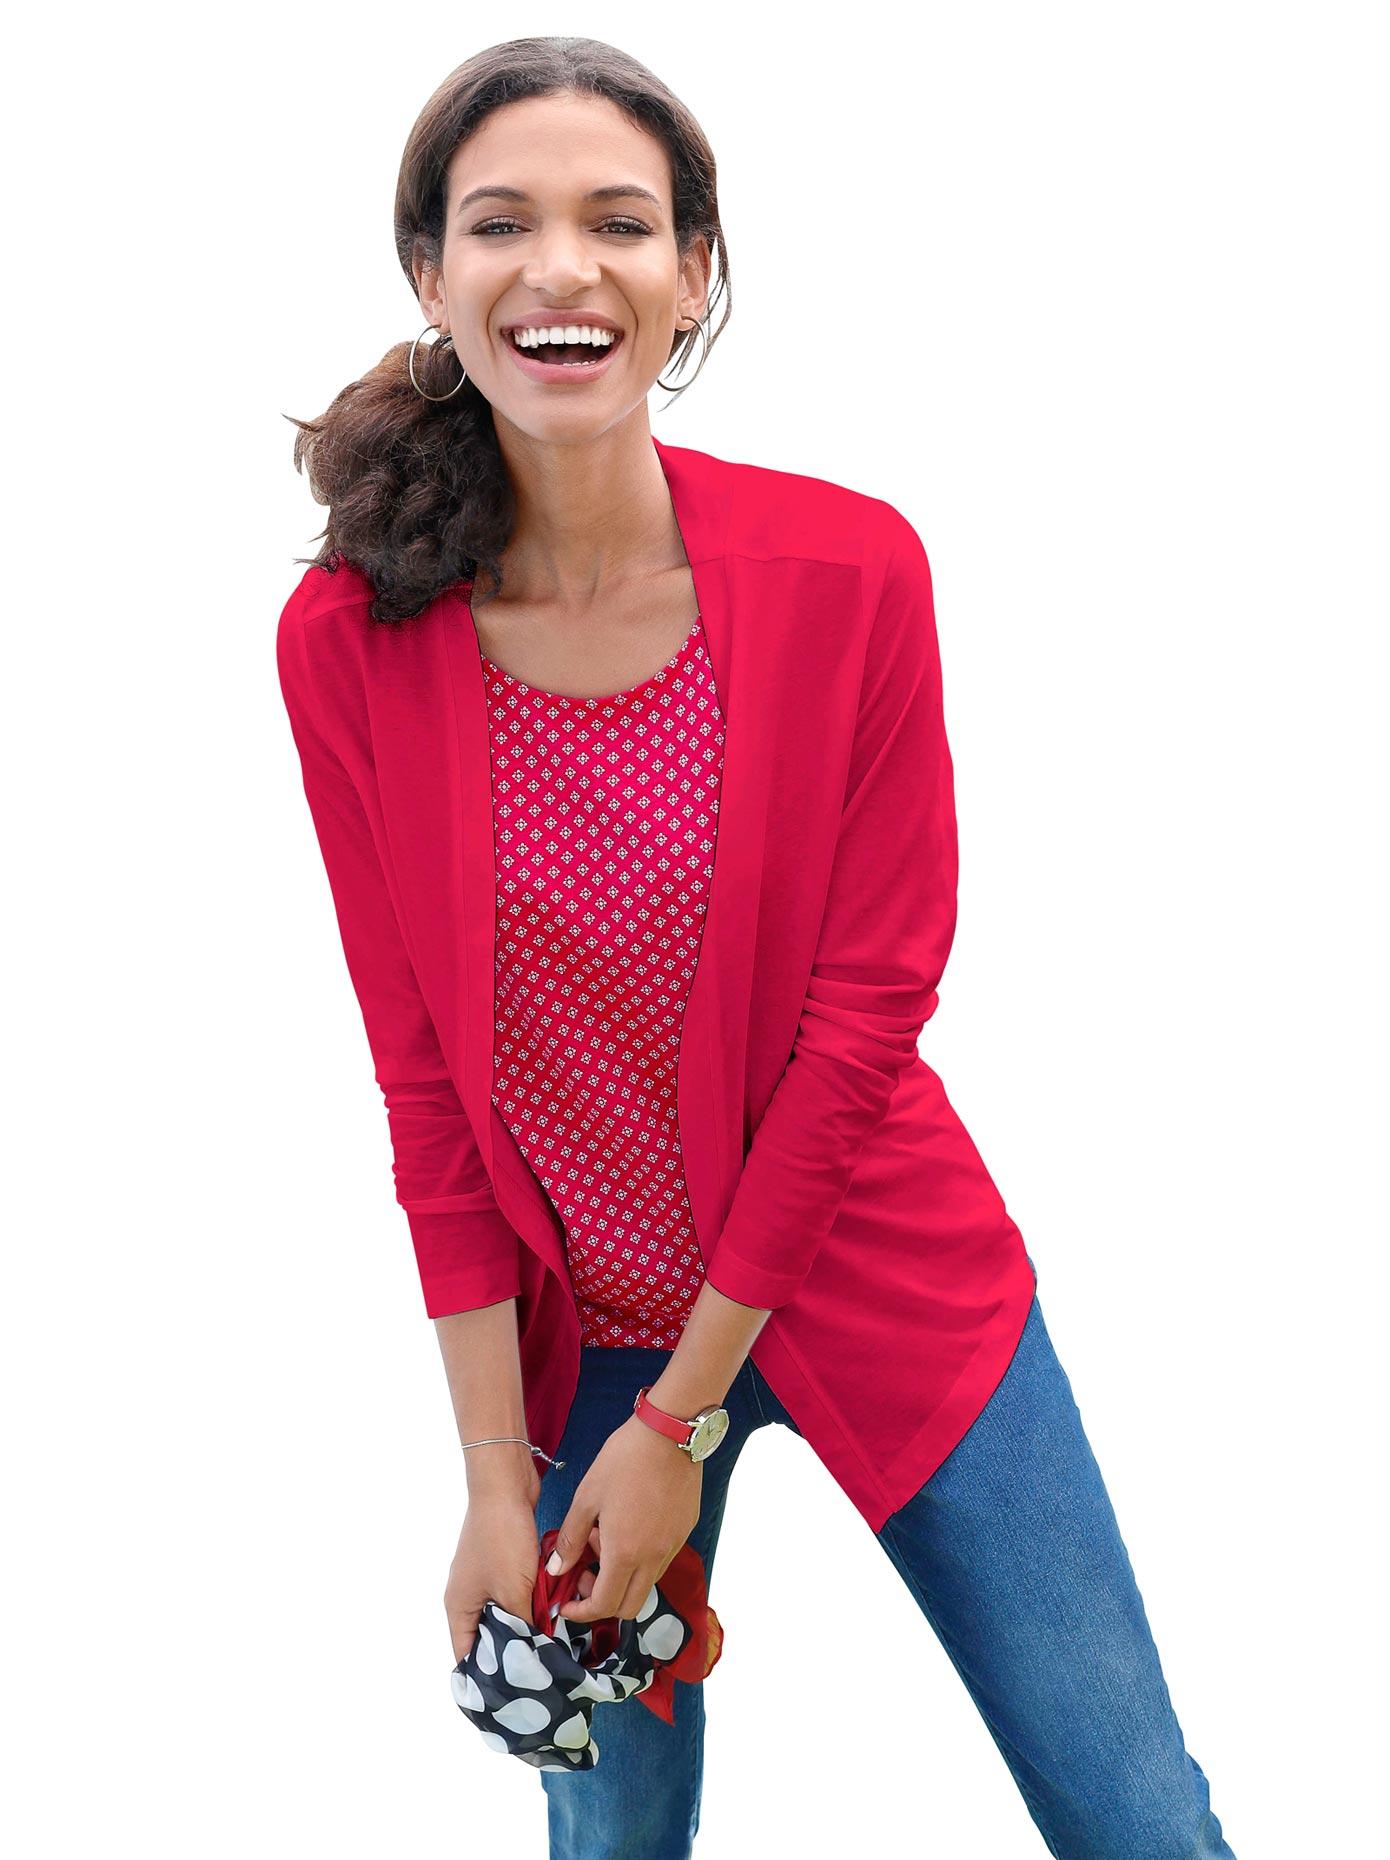 Classic Basics Shirtjacke mit angenehmer Weite | Bekleidung > Shirts > Shirtjacken | Classic Basics